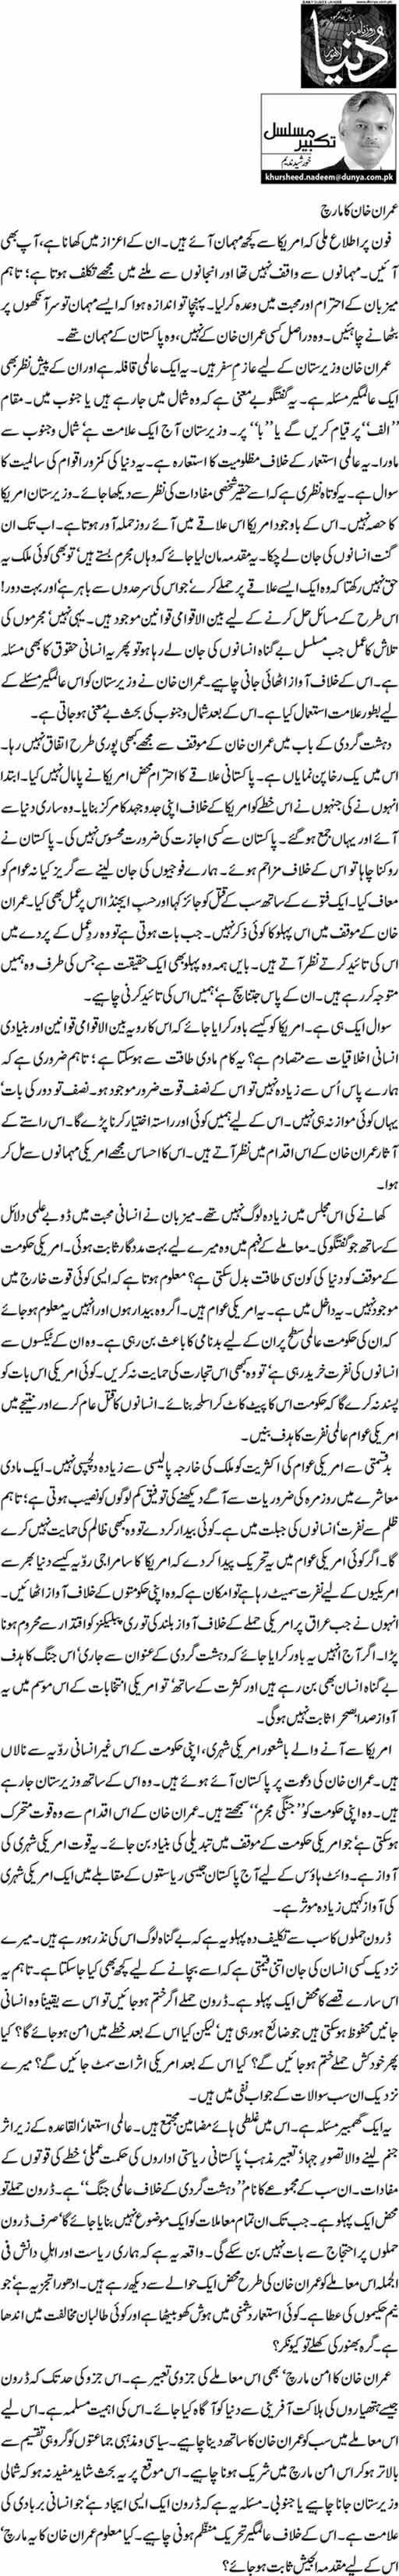 Imran Khan ka march - Khursheed Nadeem